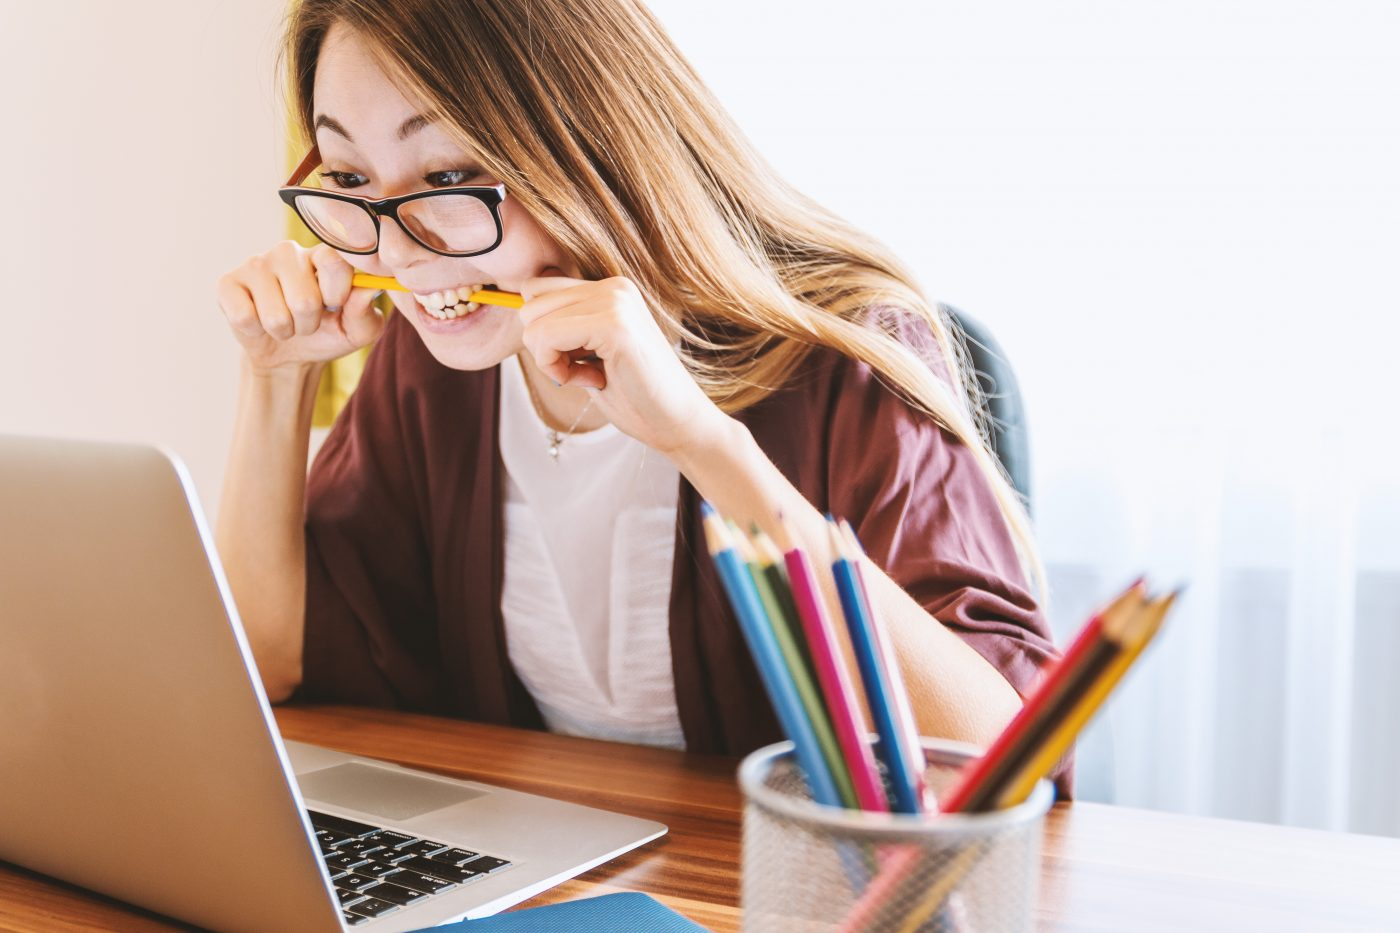 Produttività ossessiva, scatta l'allarme workhaolism